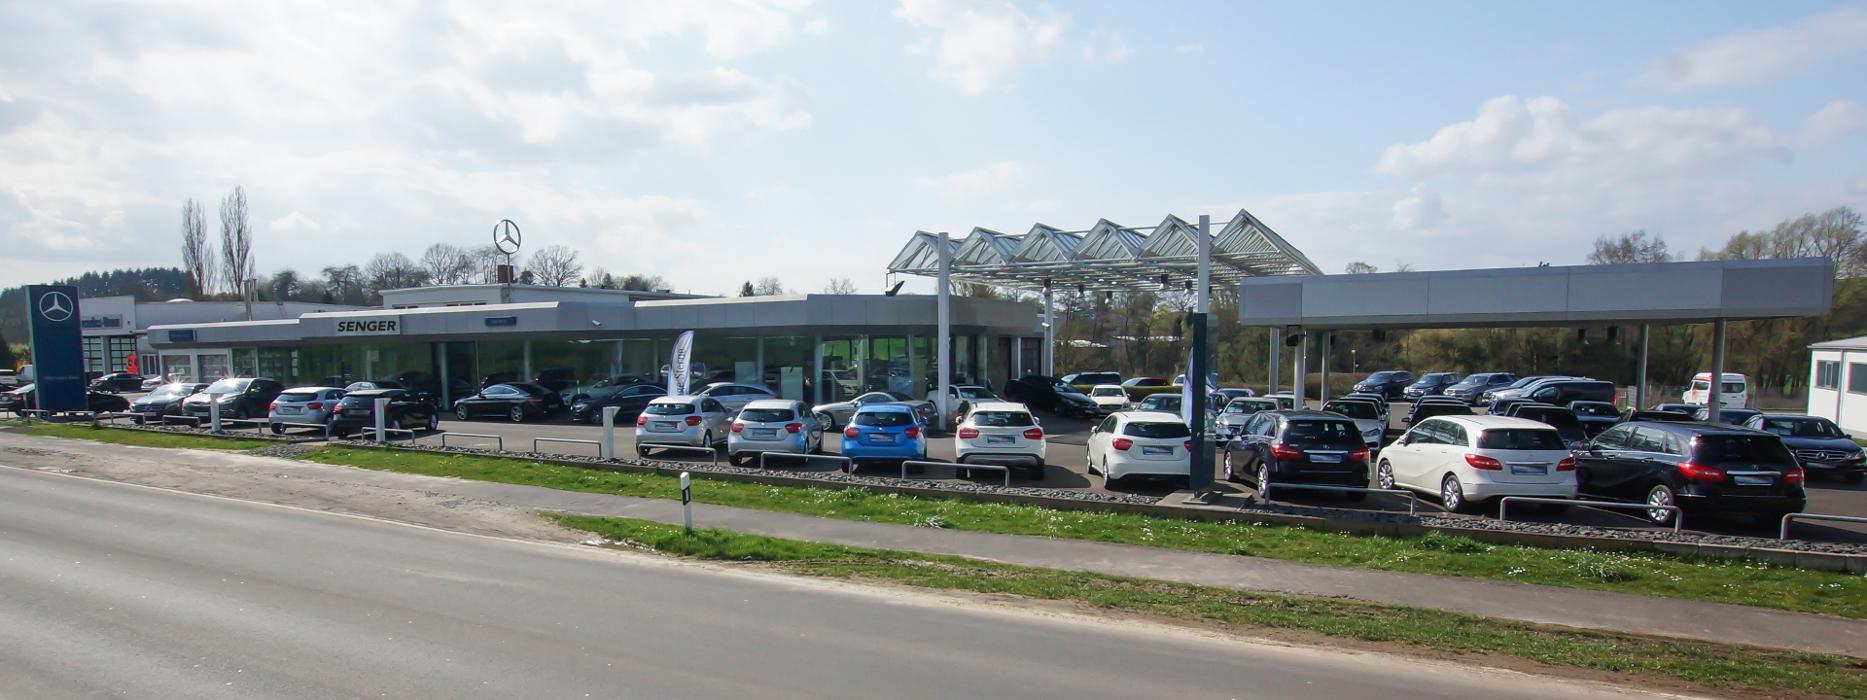 Autoelektrik Bosch Dienste Budingen 63654 Yellowmap